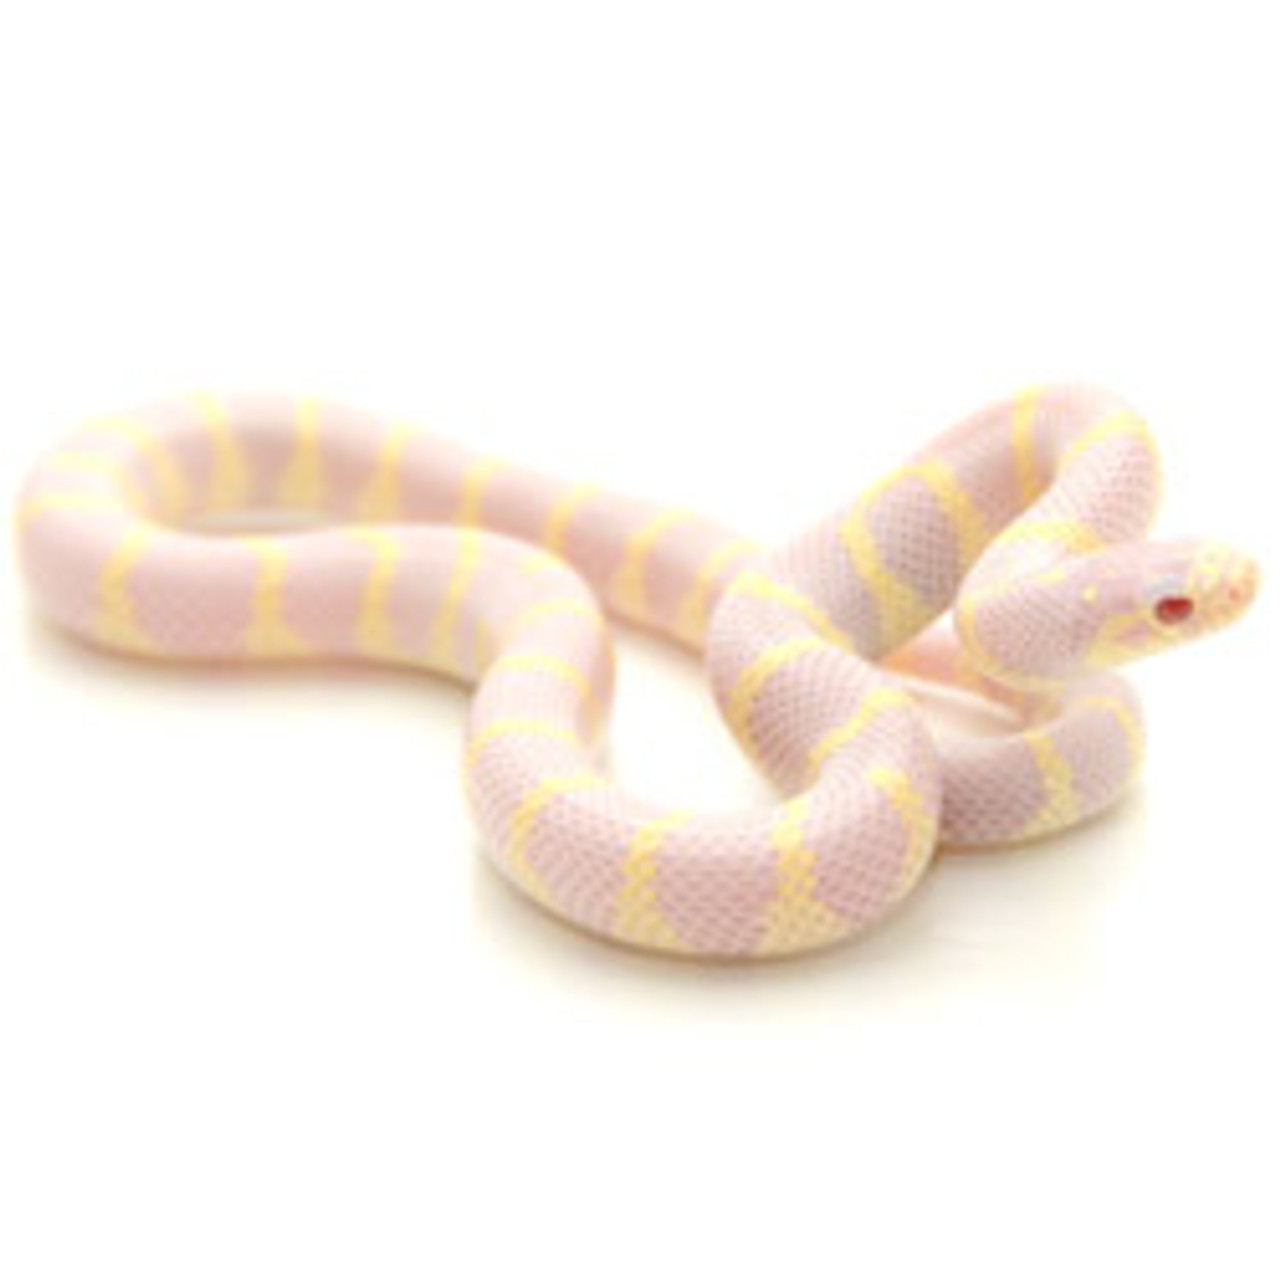 Albino Banded California King Snake (Lampropeltis getula)